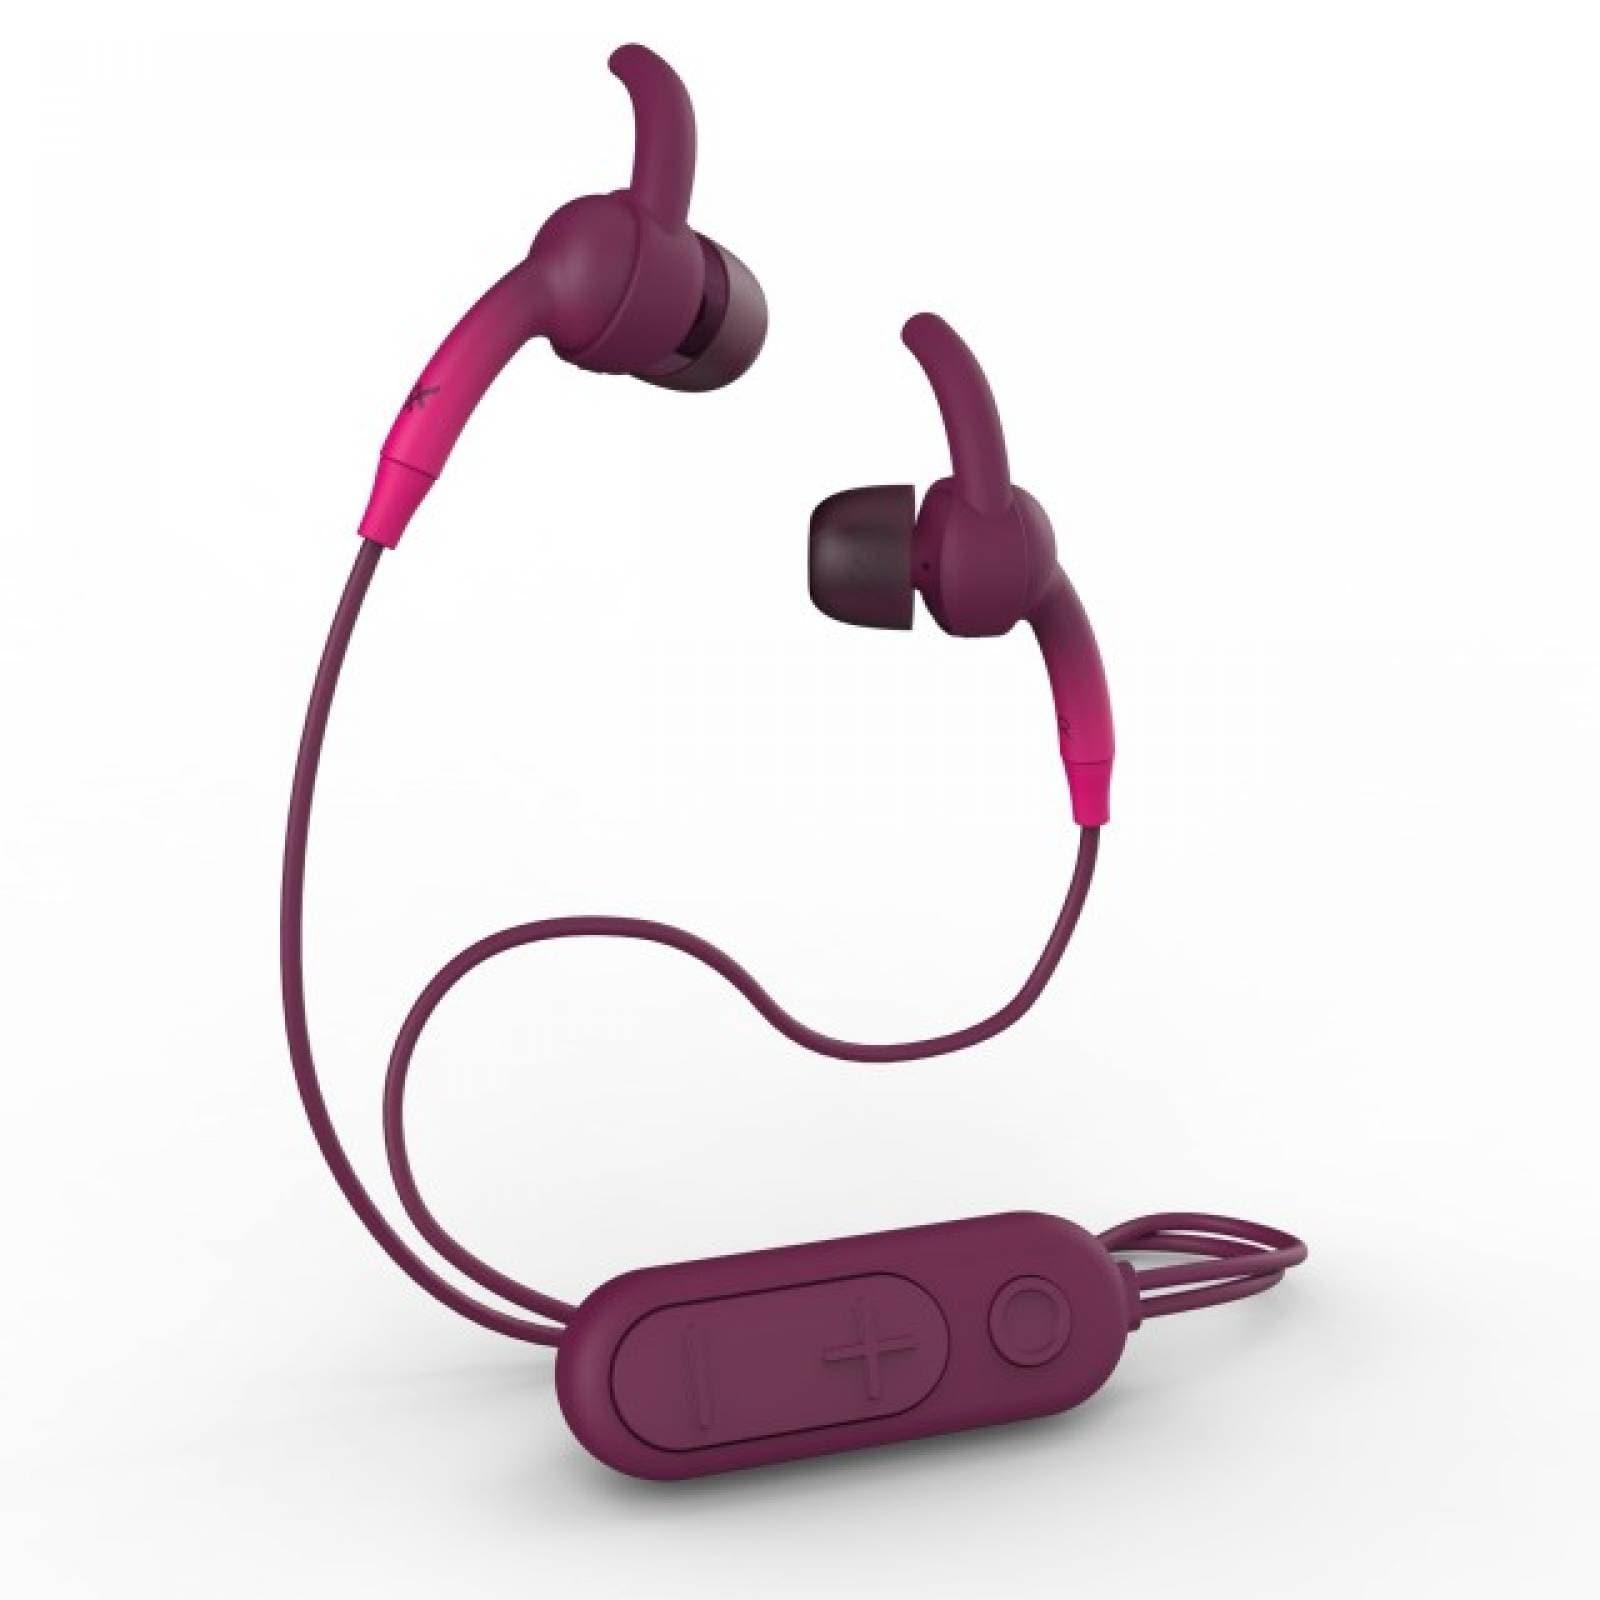 Audífonos In Ear Bluetooth morados/rosa iFrogz